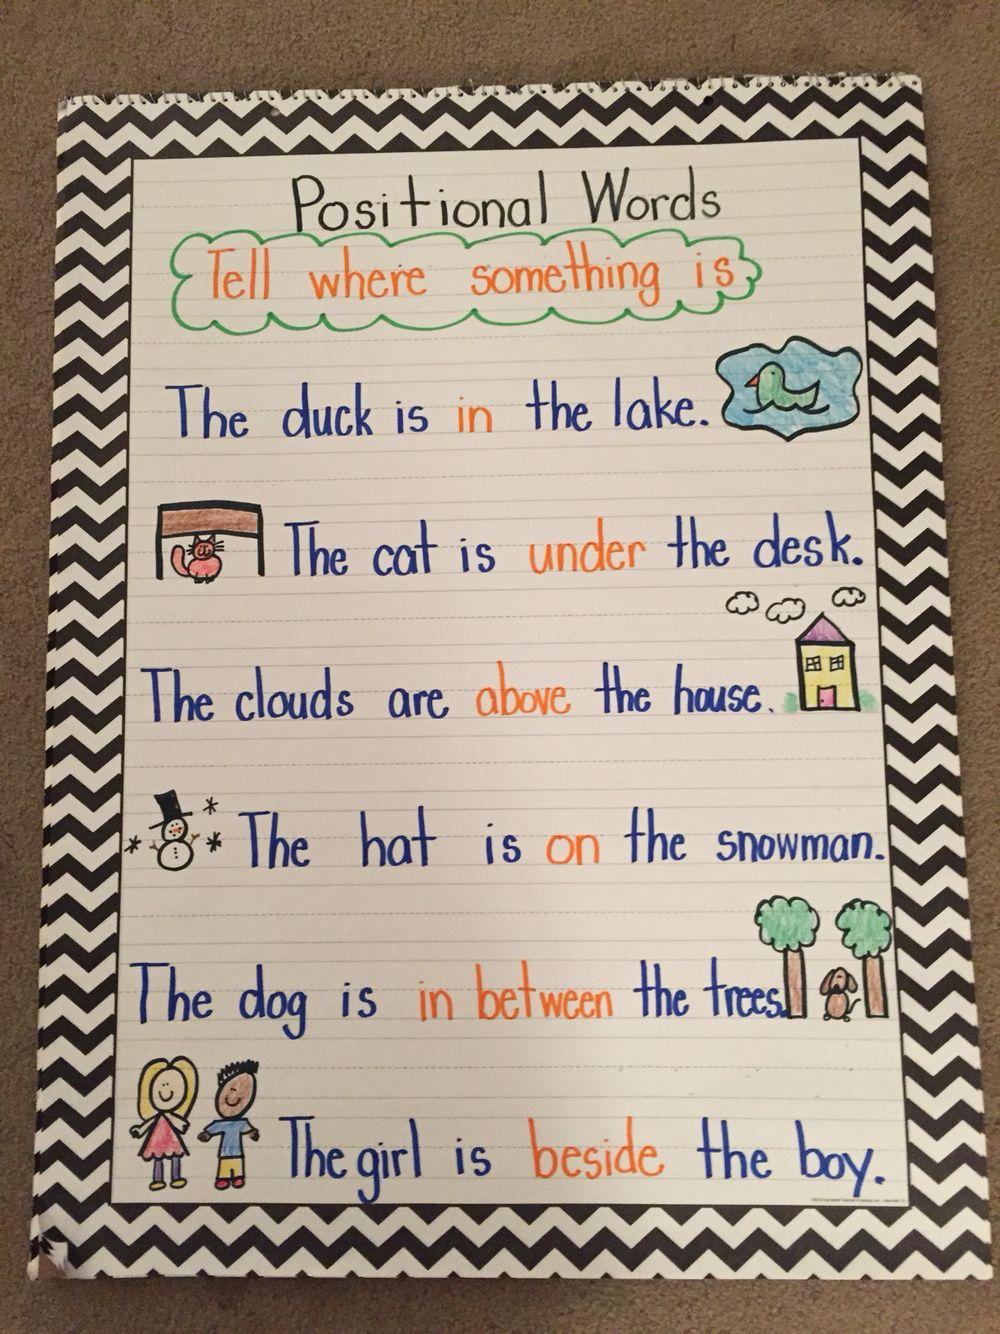 Pin By Val Whitlock On Positional Words Opposites Kindergarten Position Words Common Core Science Free Kindergarten Worksheets [ 1334 x 1000 Pixel ]